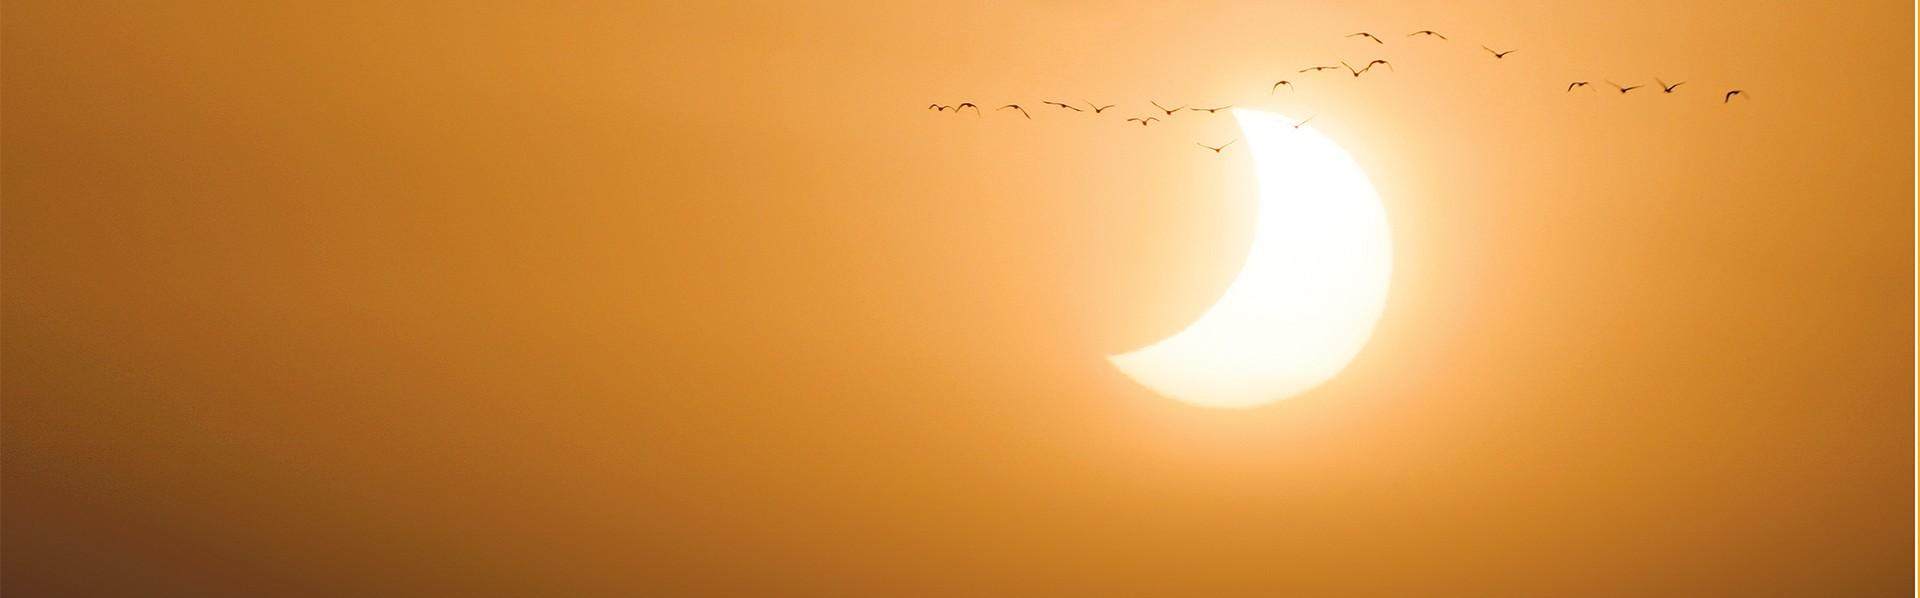 ¡Eclipses solares en Argentina!